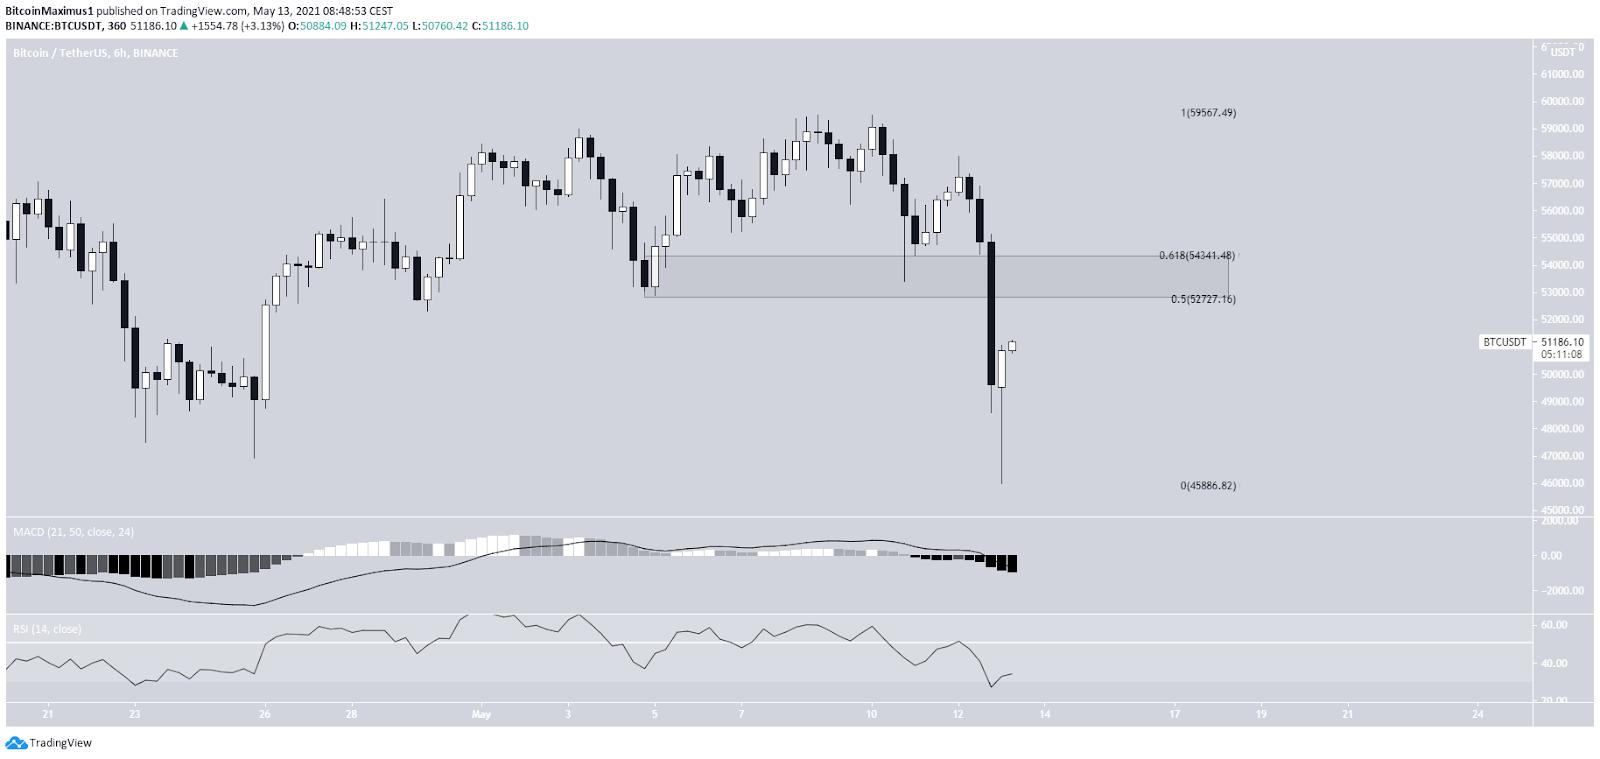 Bitcoin Preis Kurs 6-Stunden-Chart 13.05.2021